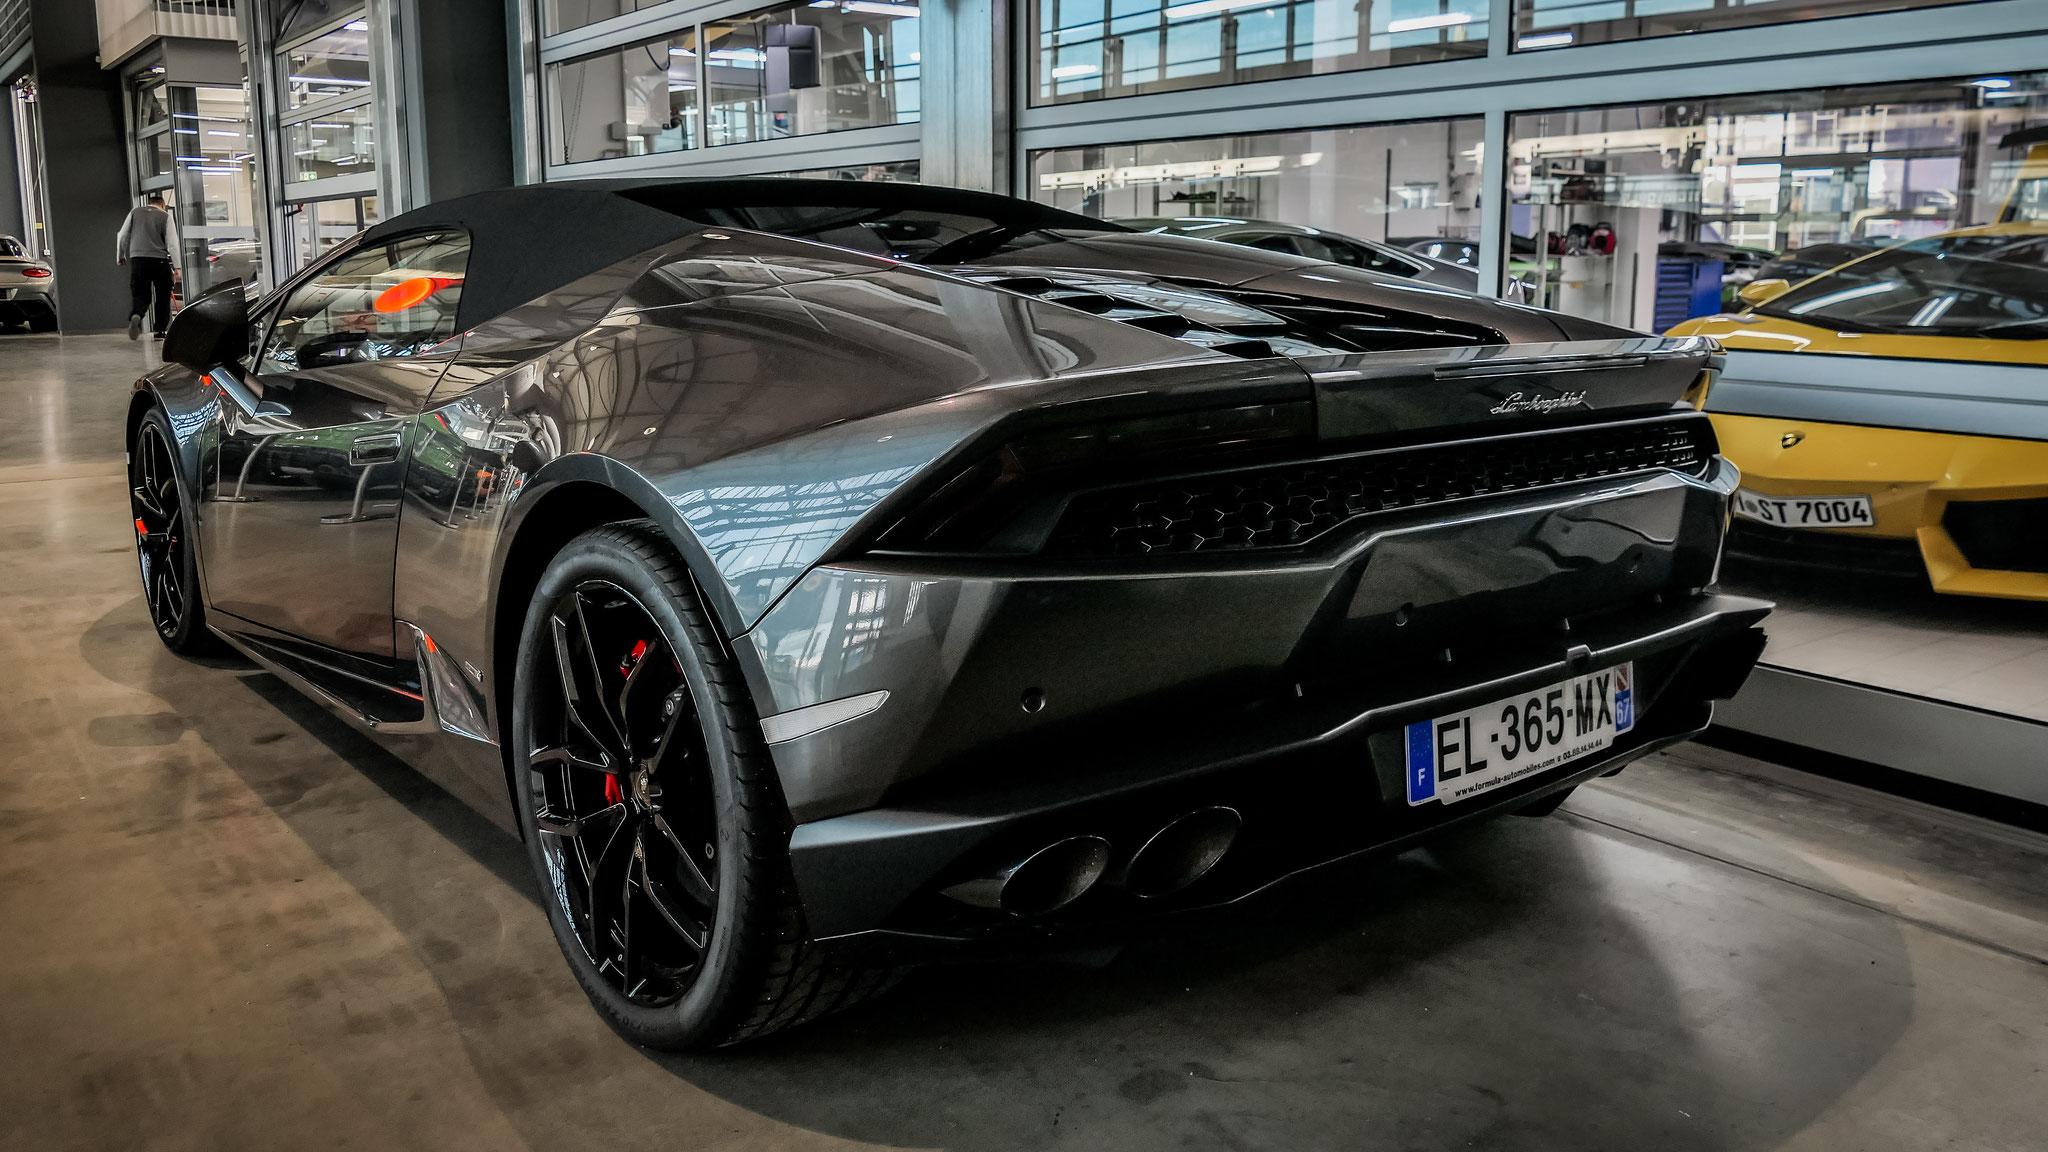 Lamborghini Huracan Spyder - EL-365-MX-67 (FRA)